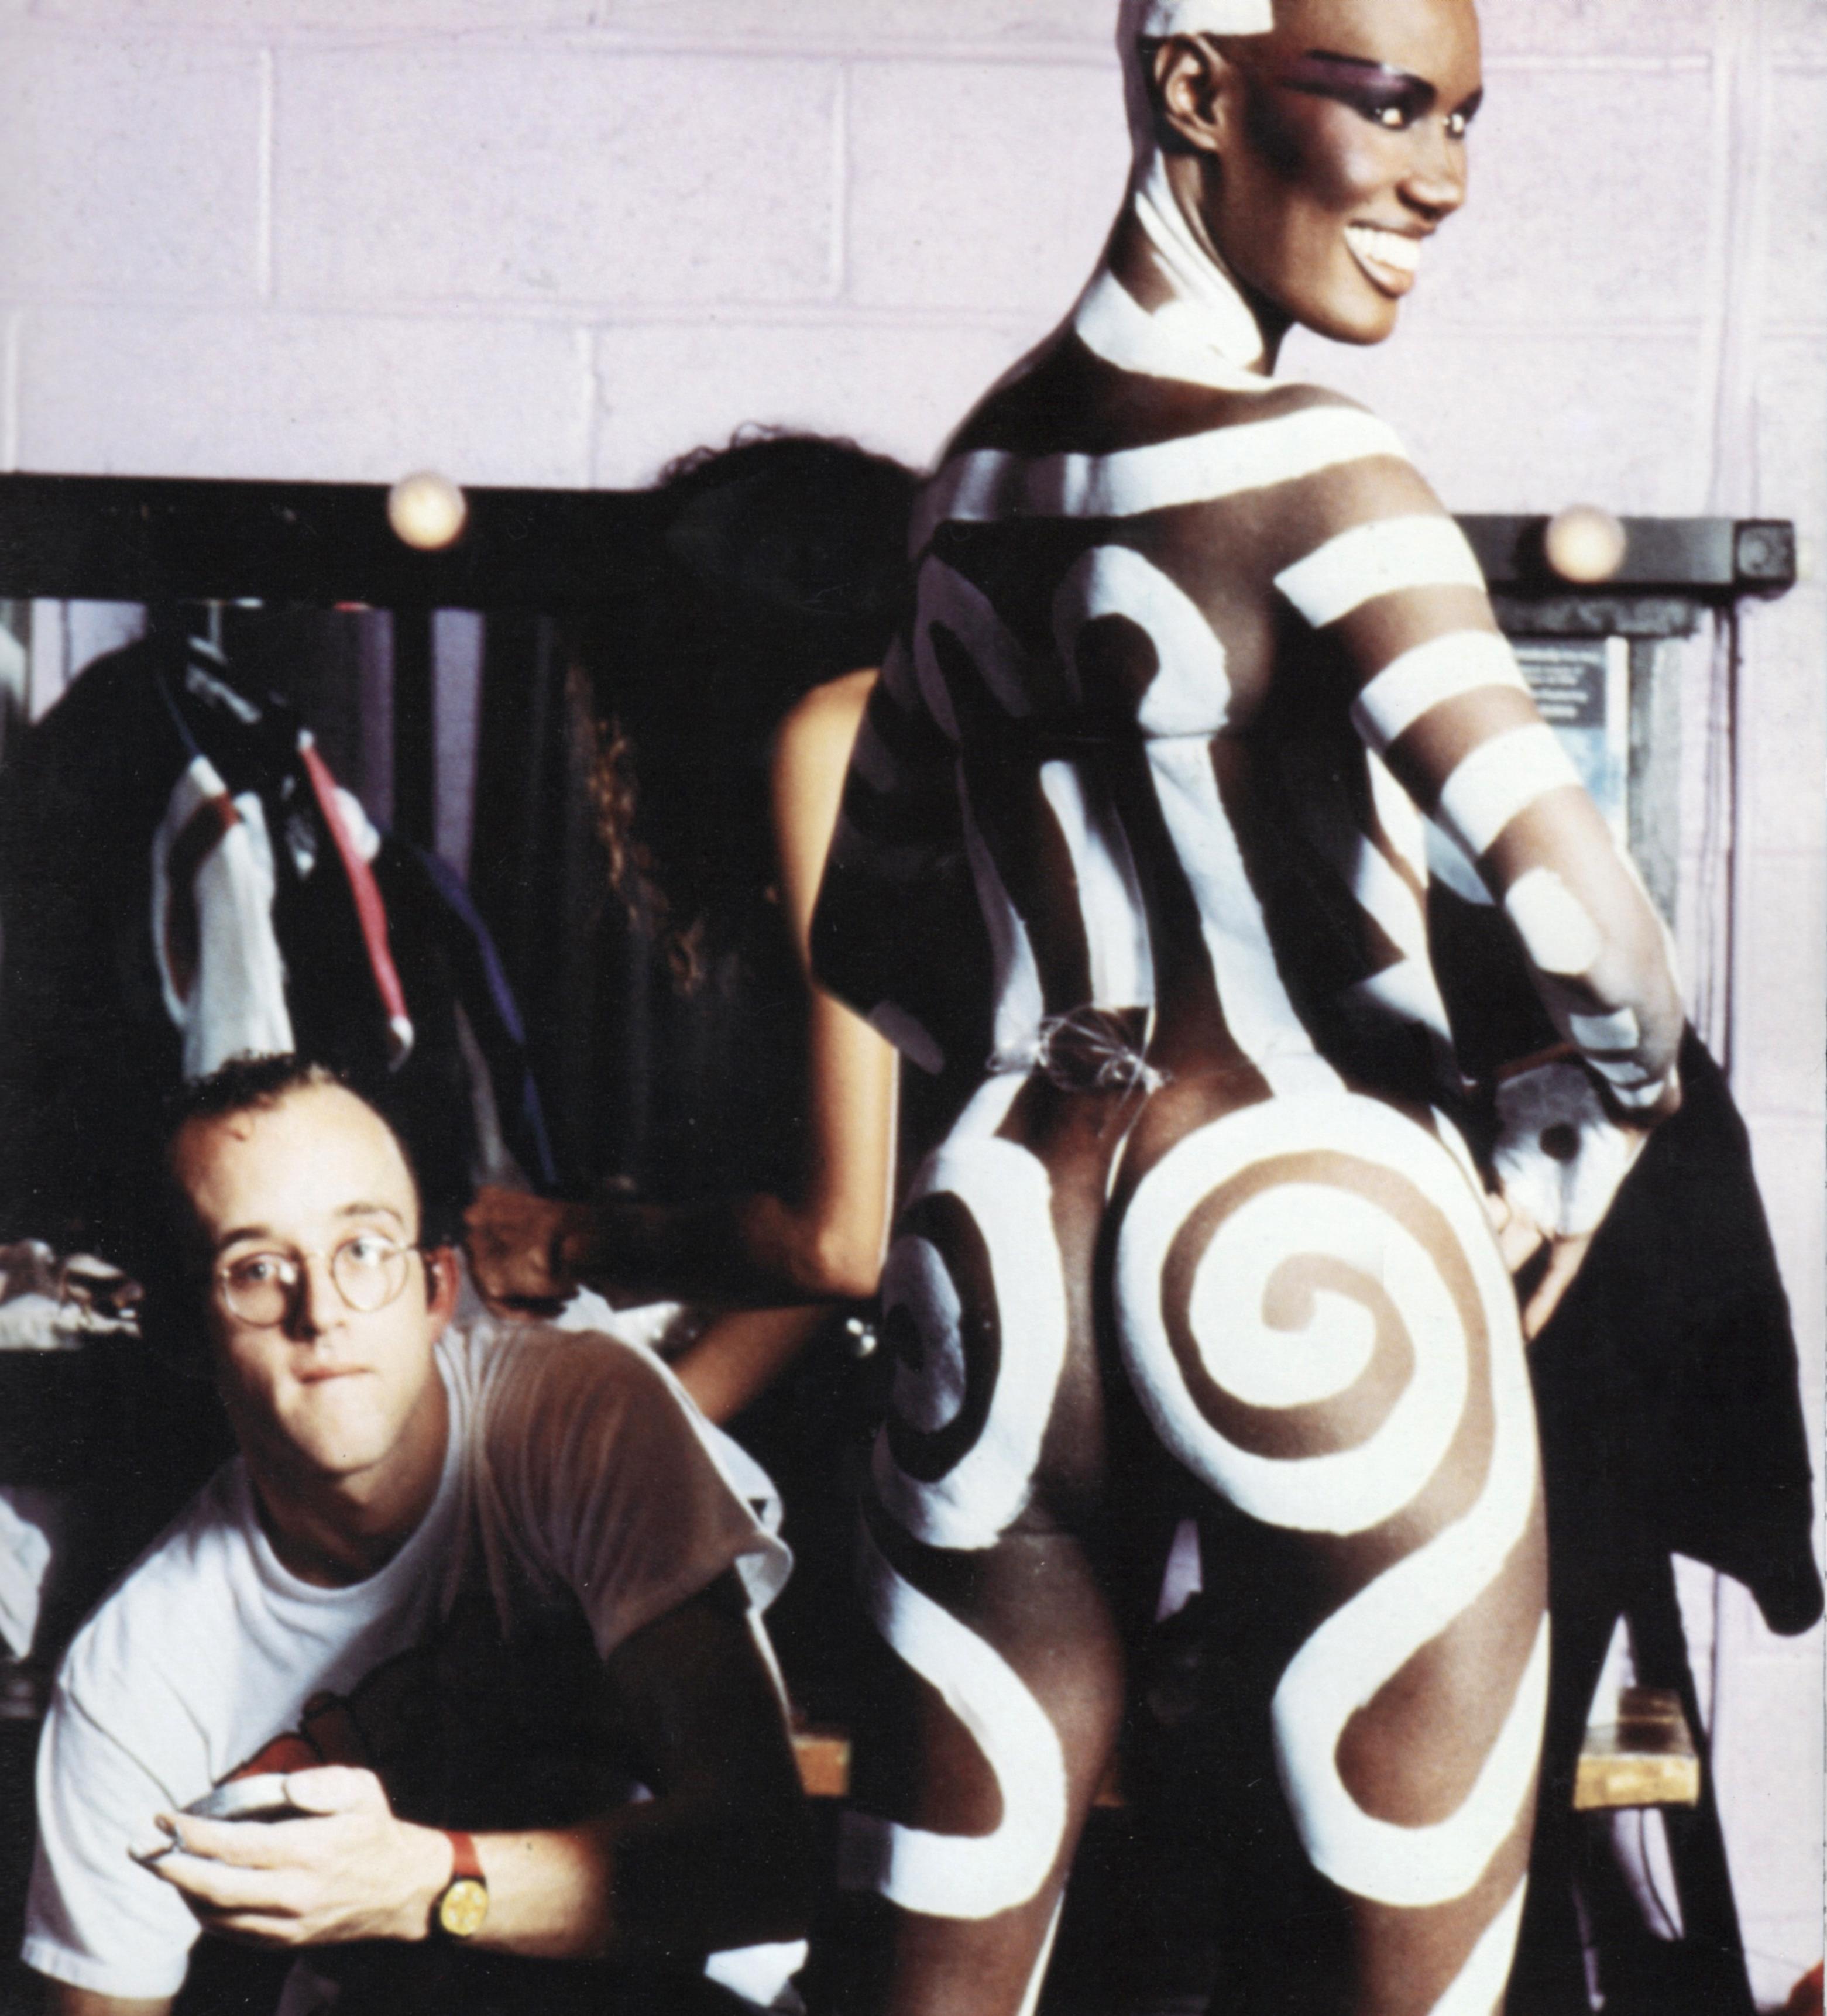 Keith Haring paints Grace Jones / Paradise Garage mid 1980's